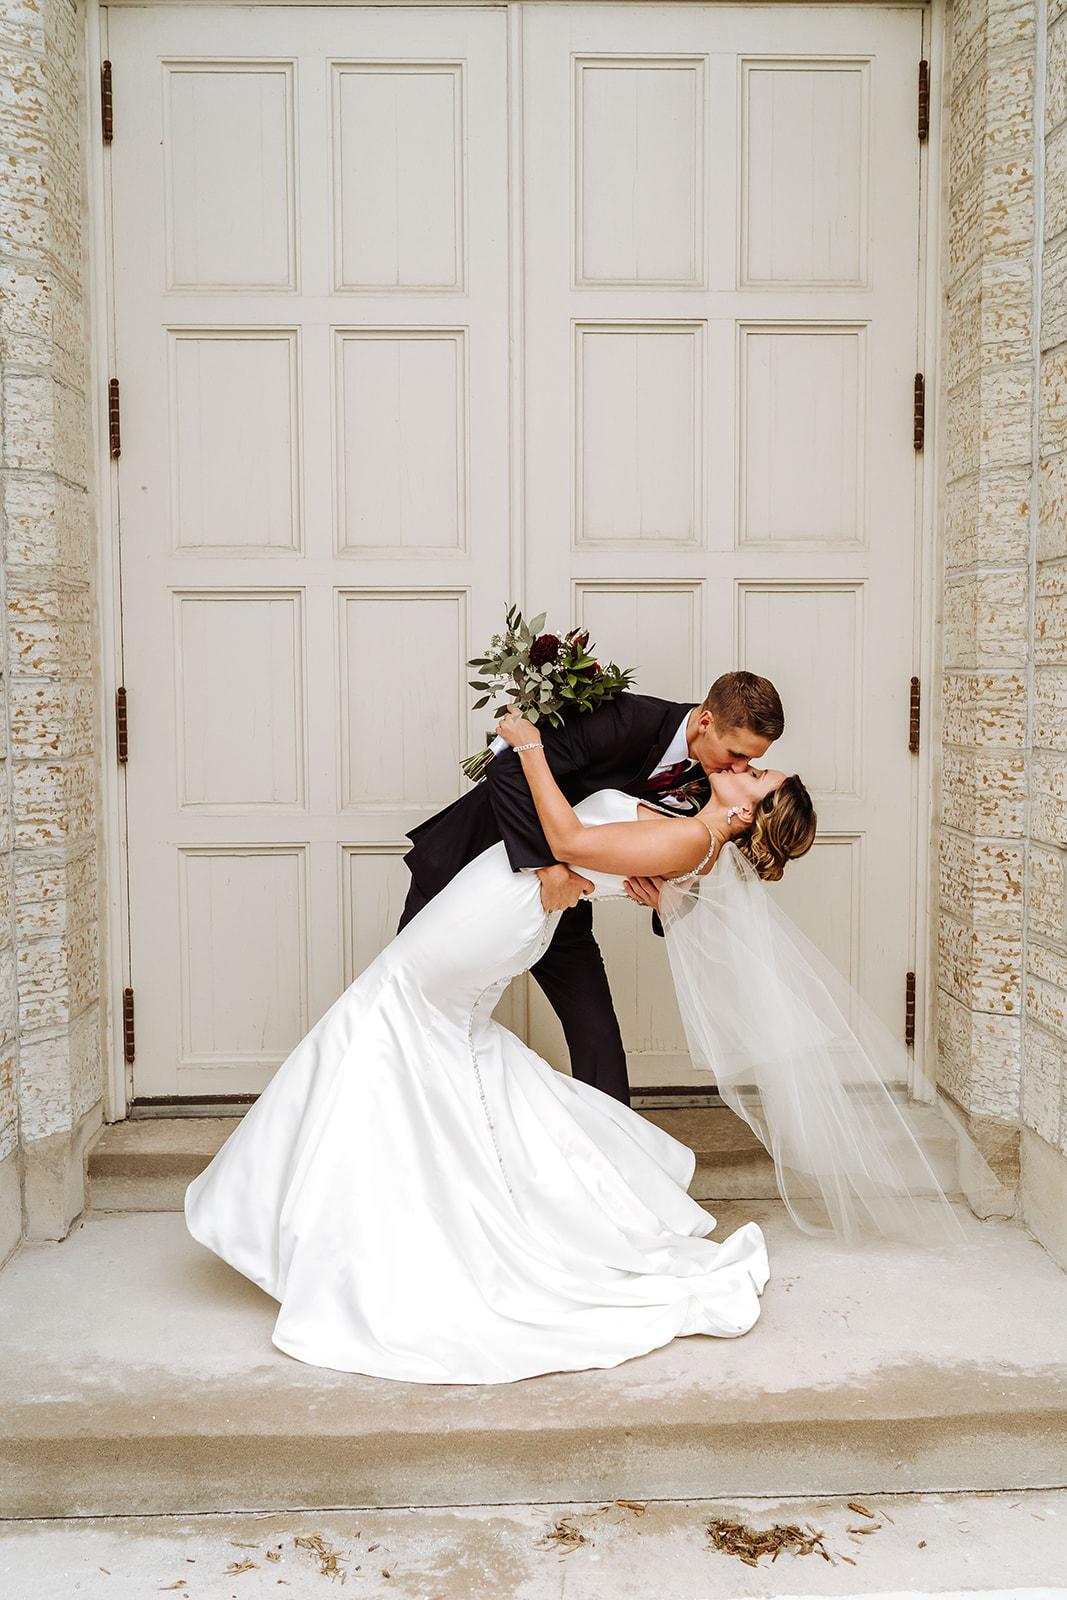 Scott and Andrea Wedding 2018-177.jpg